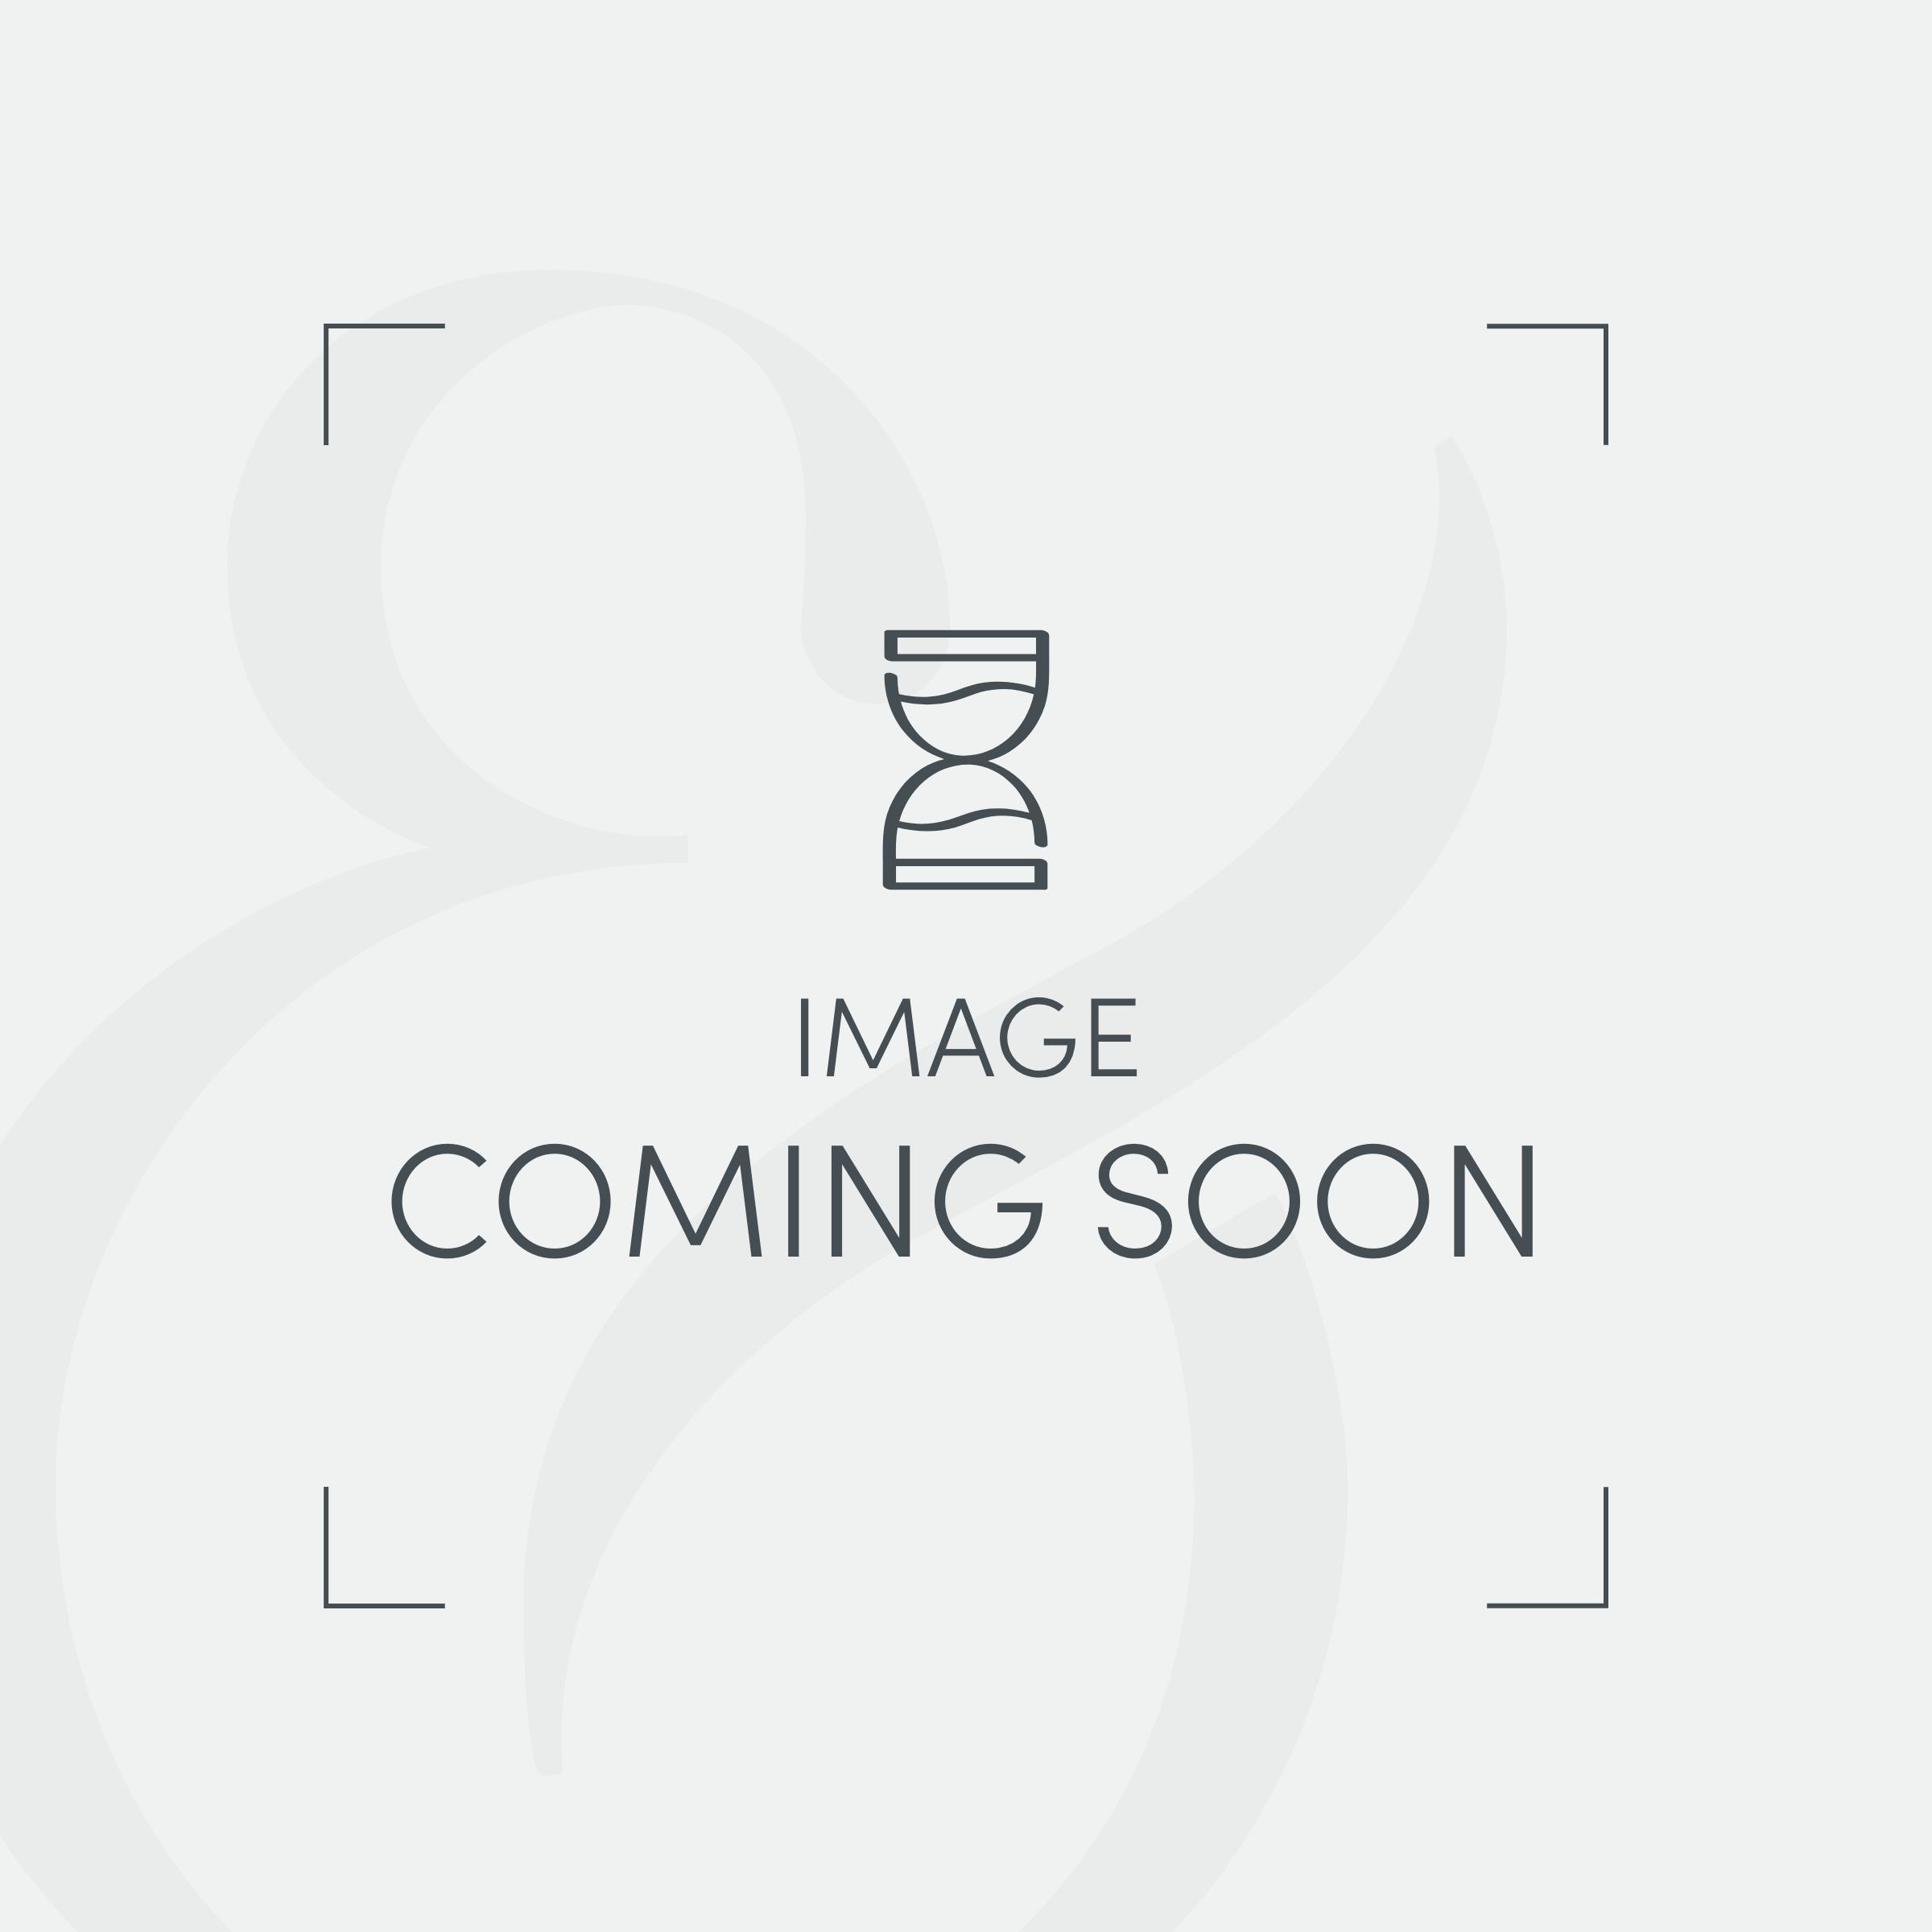 Luxury 600TC Egyptian Cotton Bundle - Dark Grey - Single (Duvet Cover, Deep Fitted Sheet, Standard Oxford Pillowcase Pair)